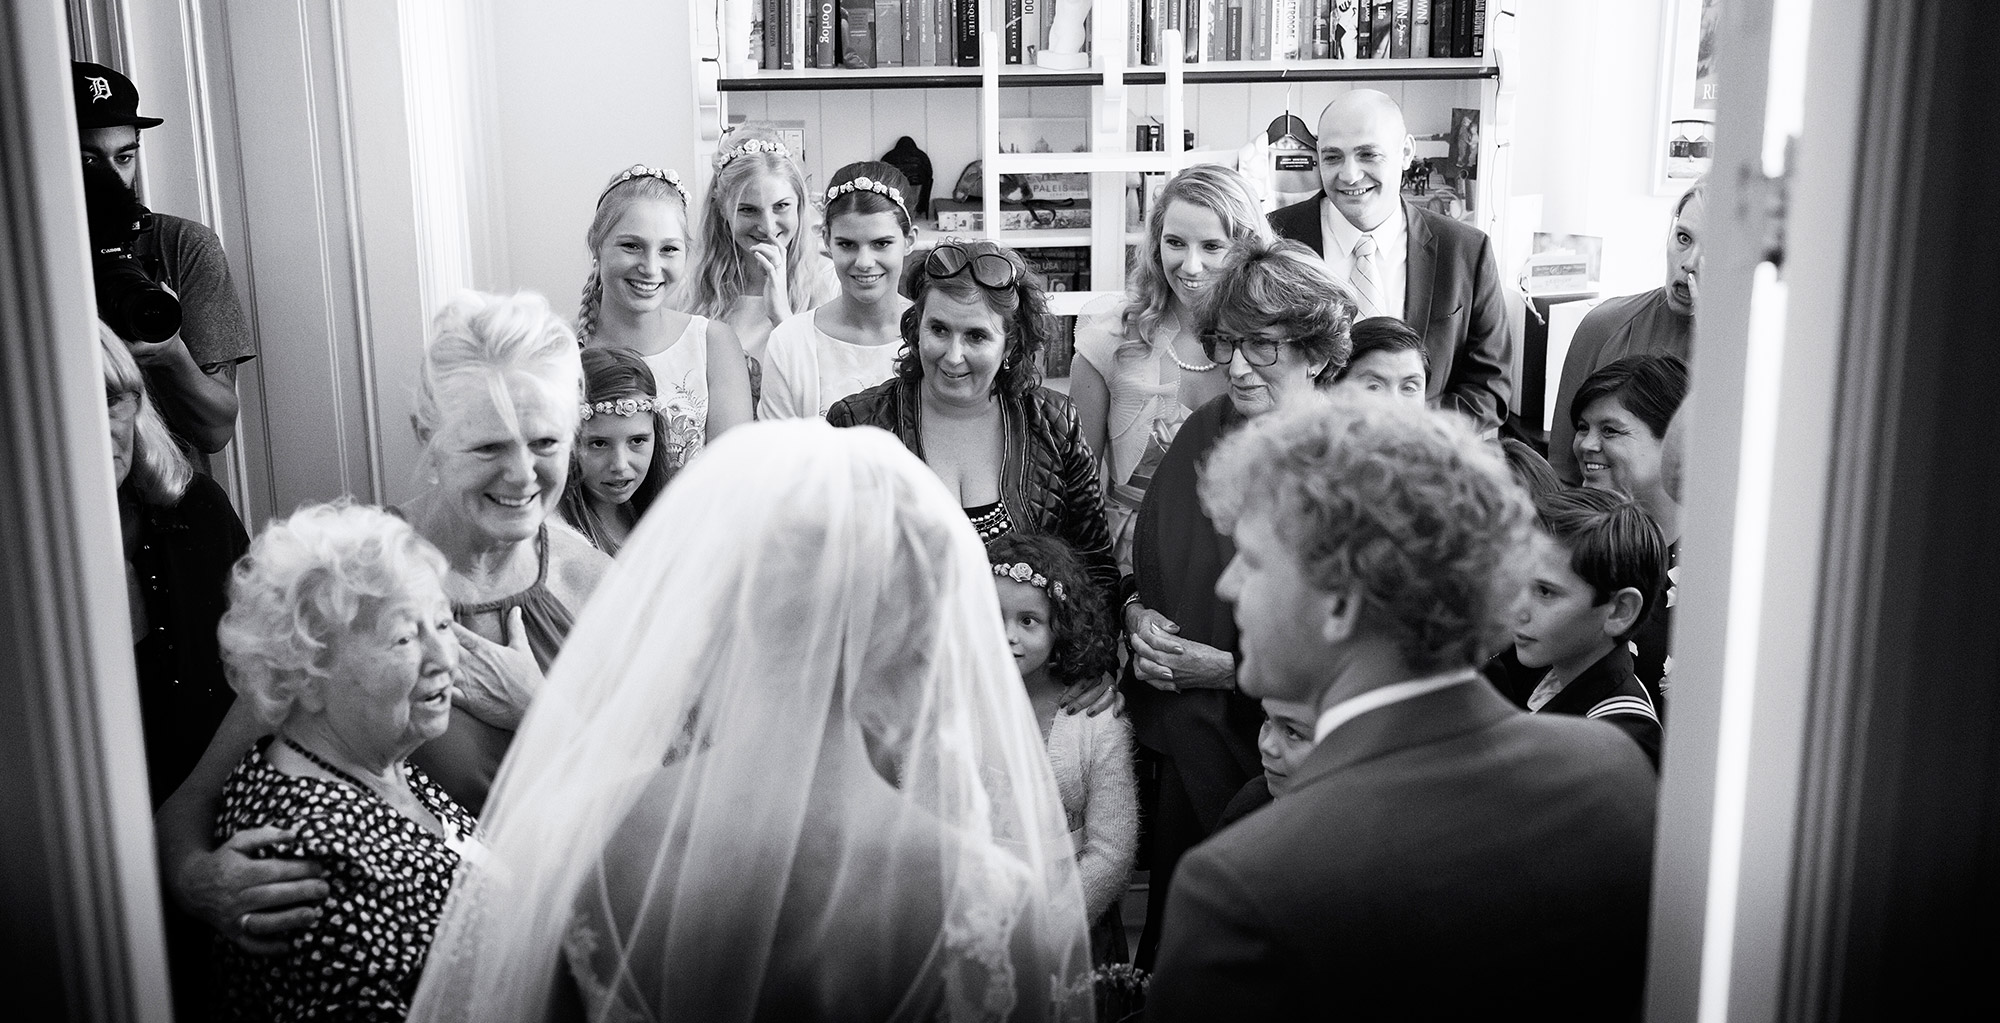 ophalen Ontmoeting bruid en bruidegom trouwfoto trouwdag